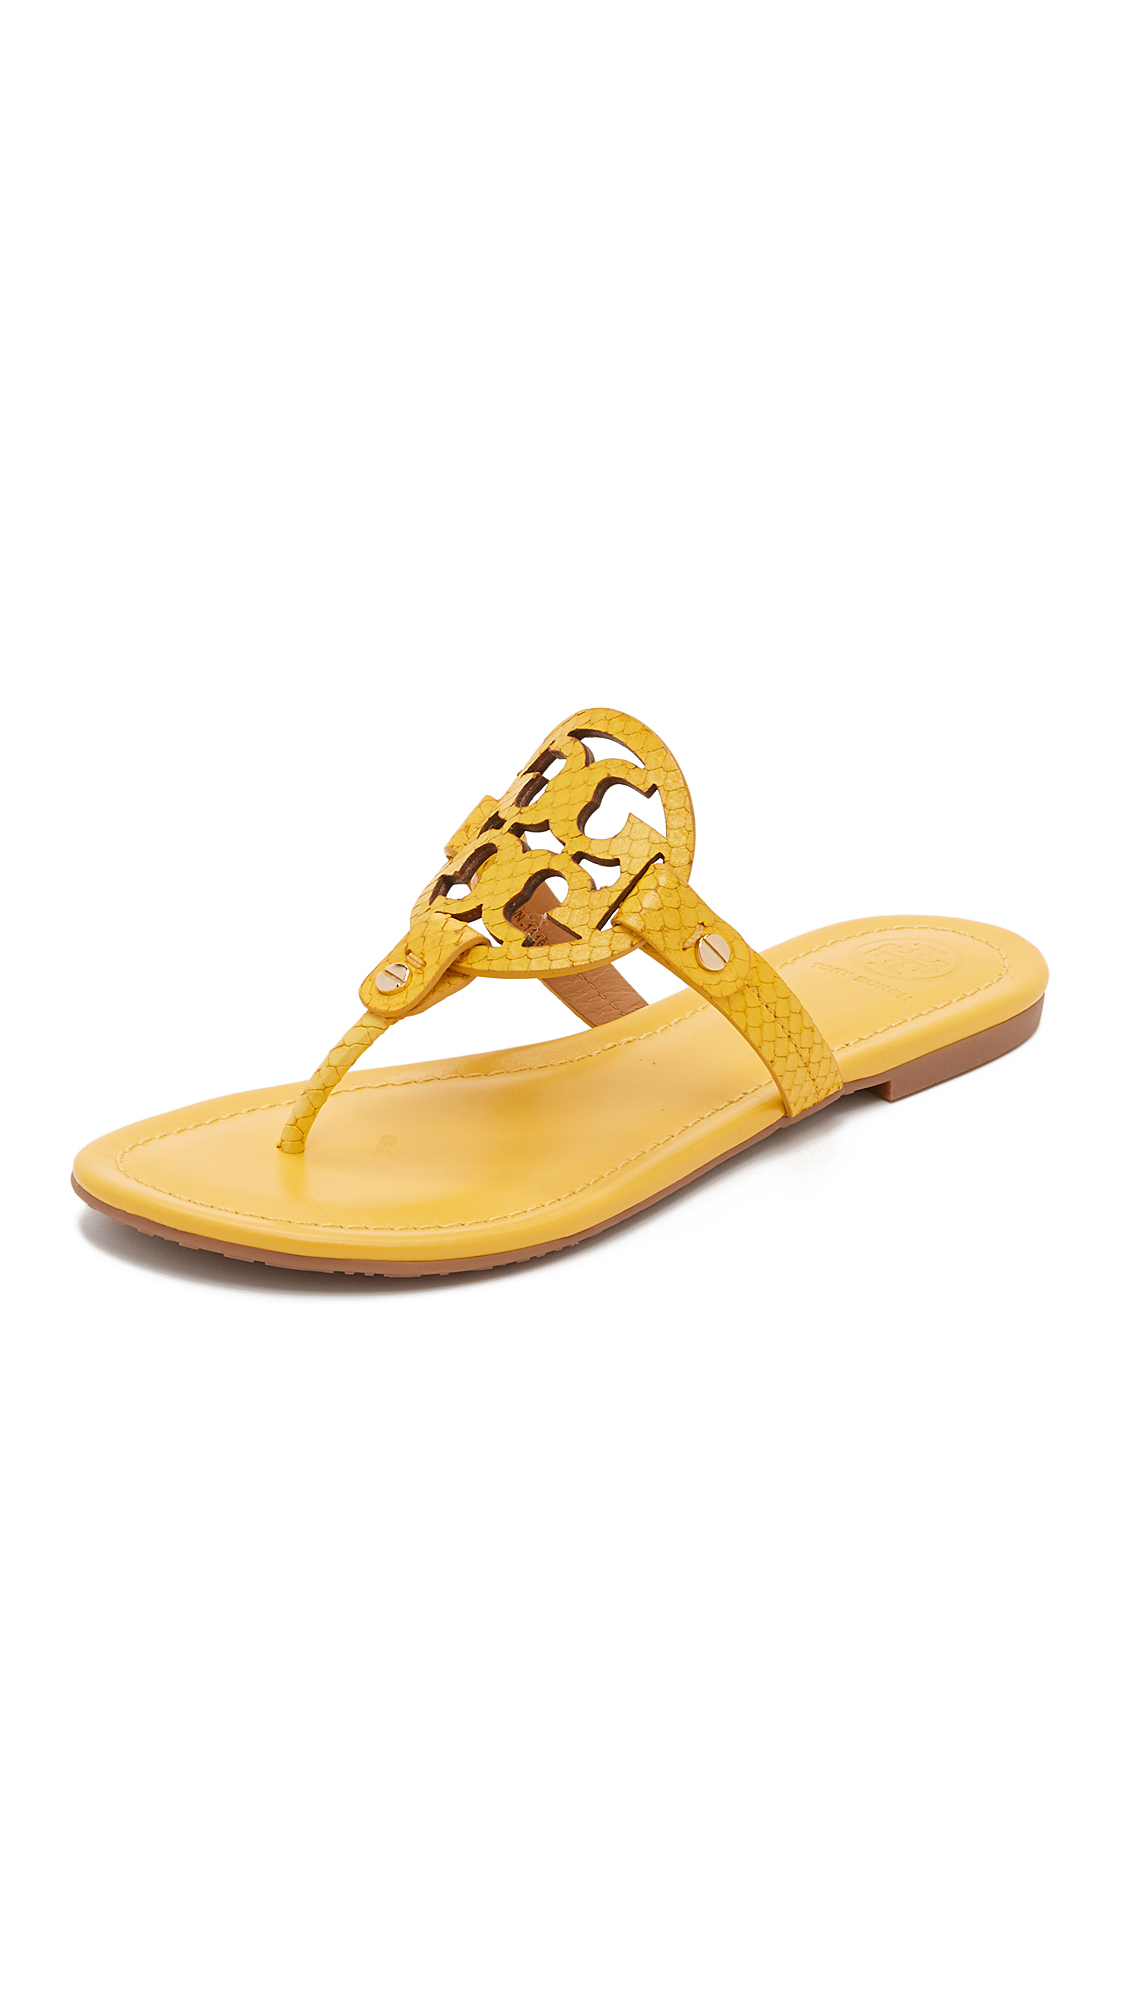 221a6d430 Lyst - Tory Burch Miller Sandals in Yellow